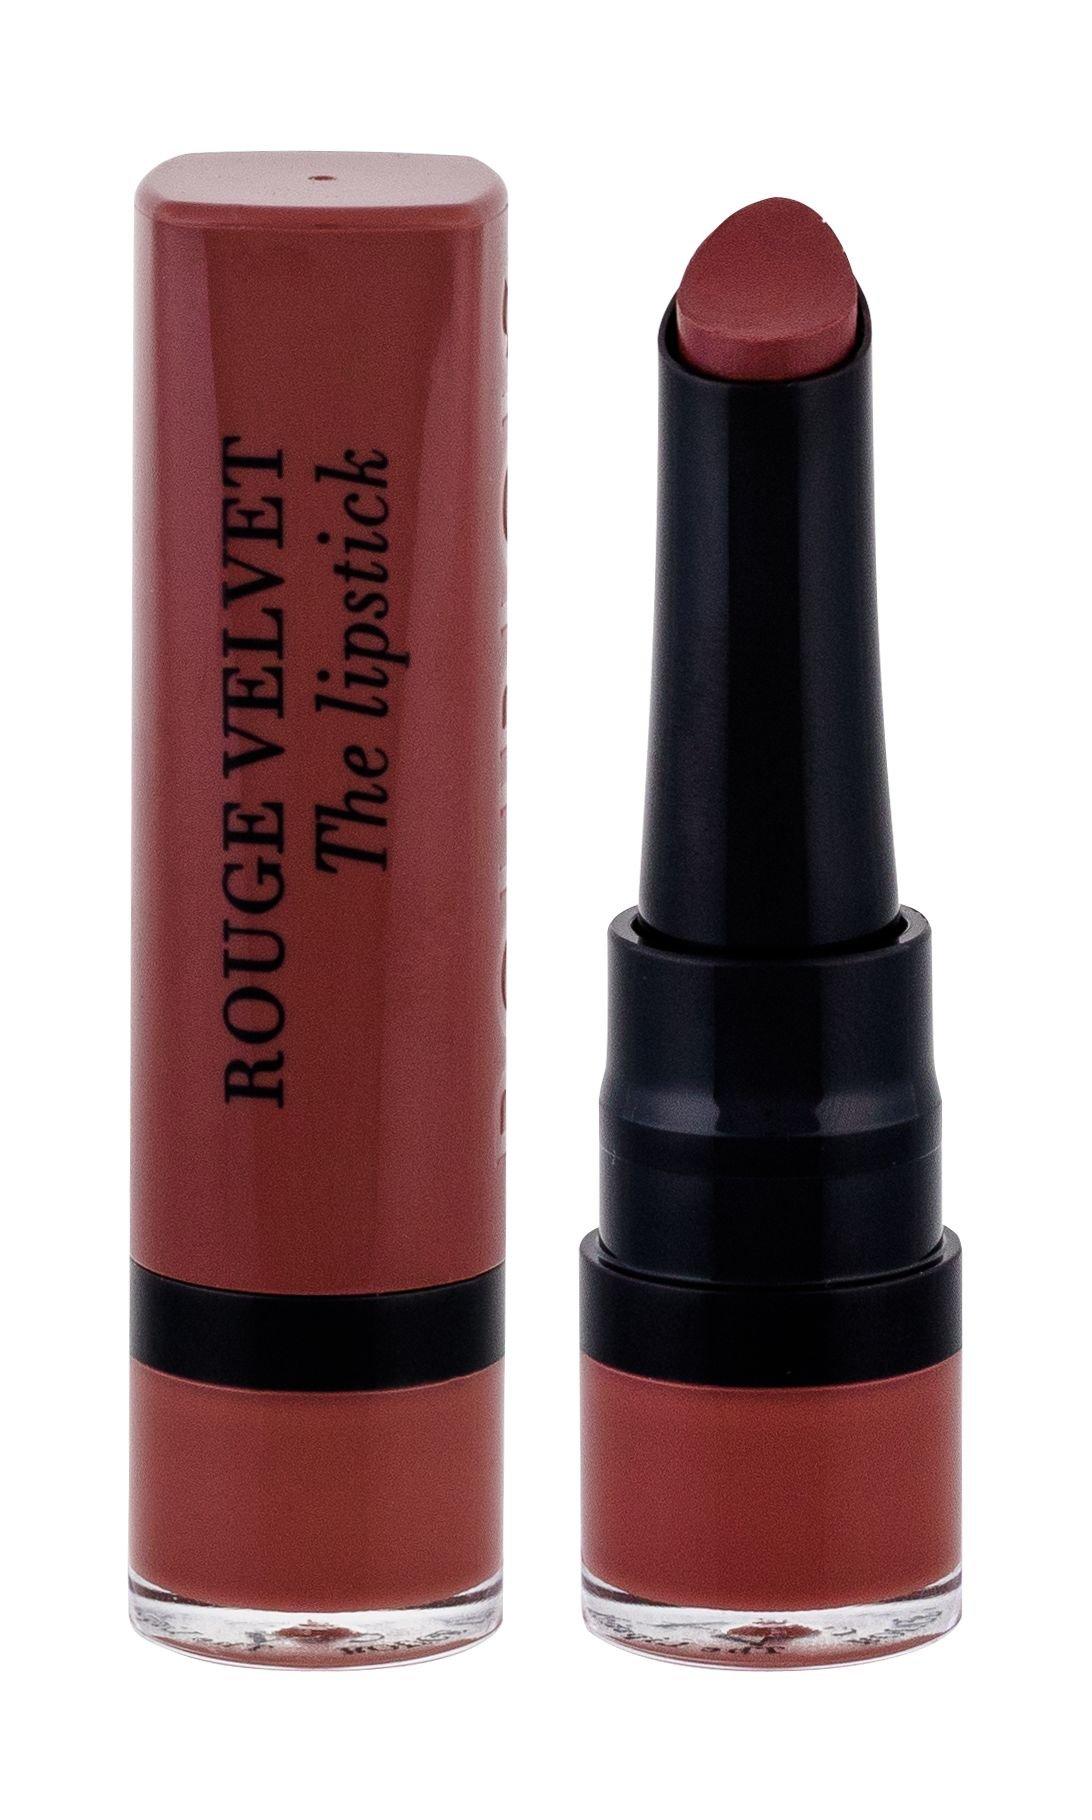 BOURJOIS Paris Rouge Velvet Lipstick 2,4ml 24 Pari´sienne